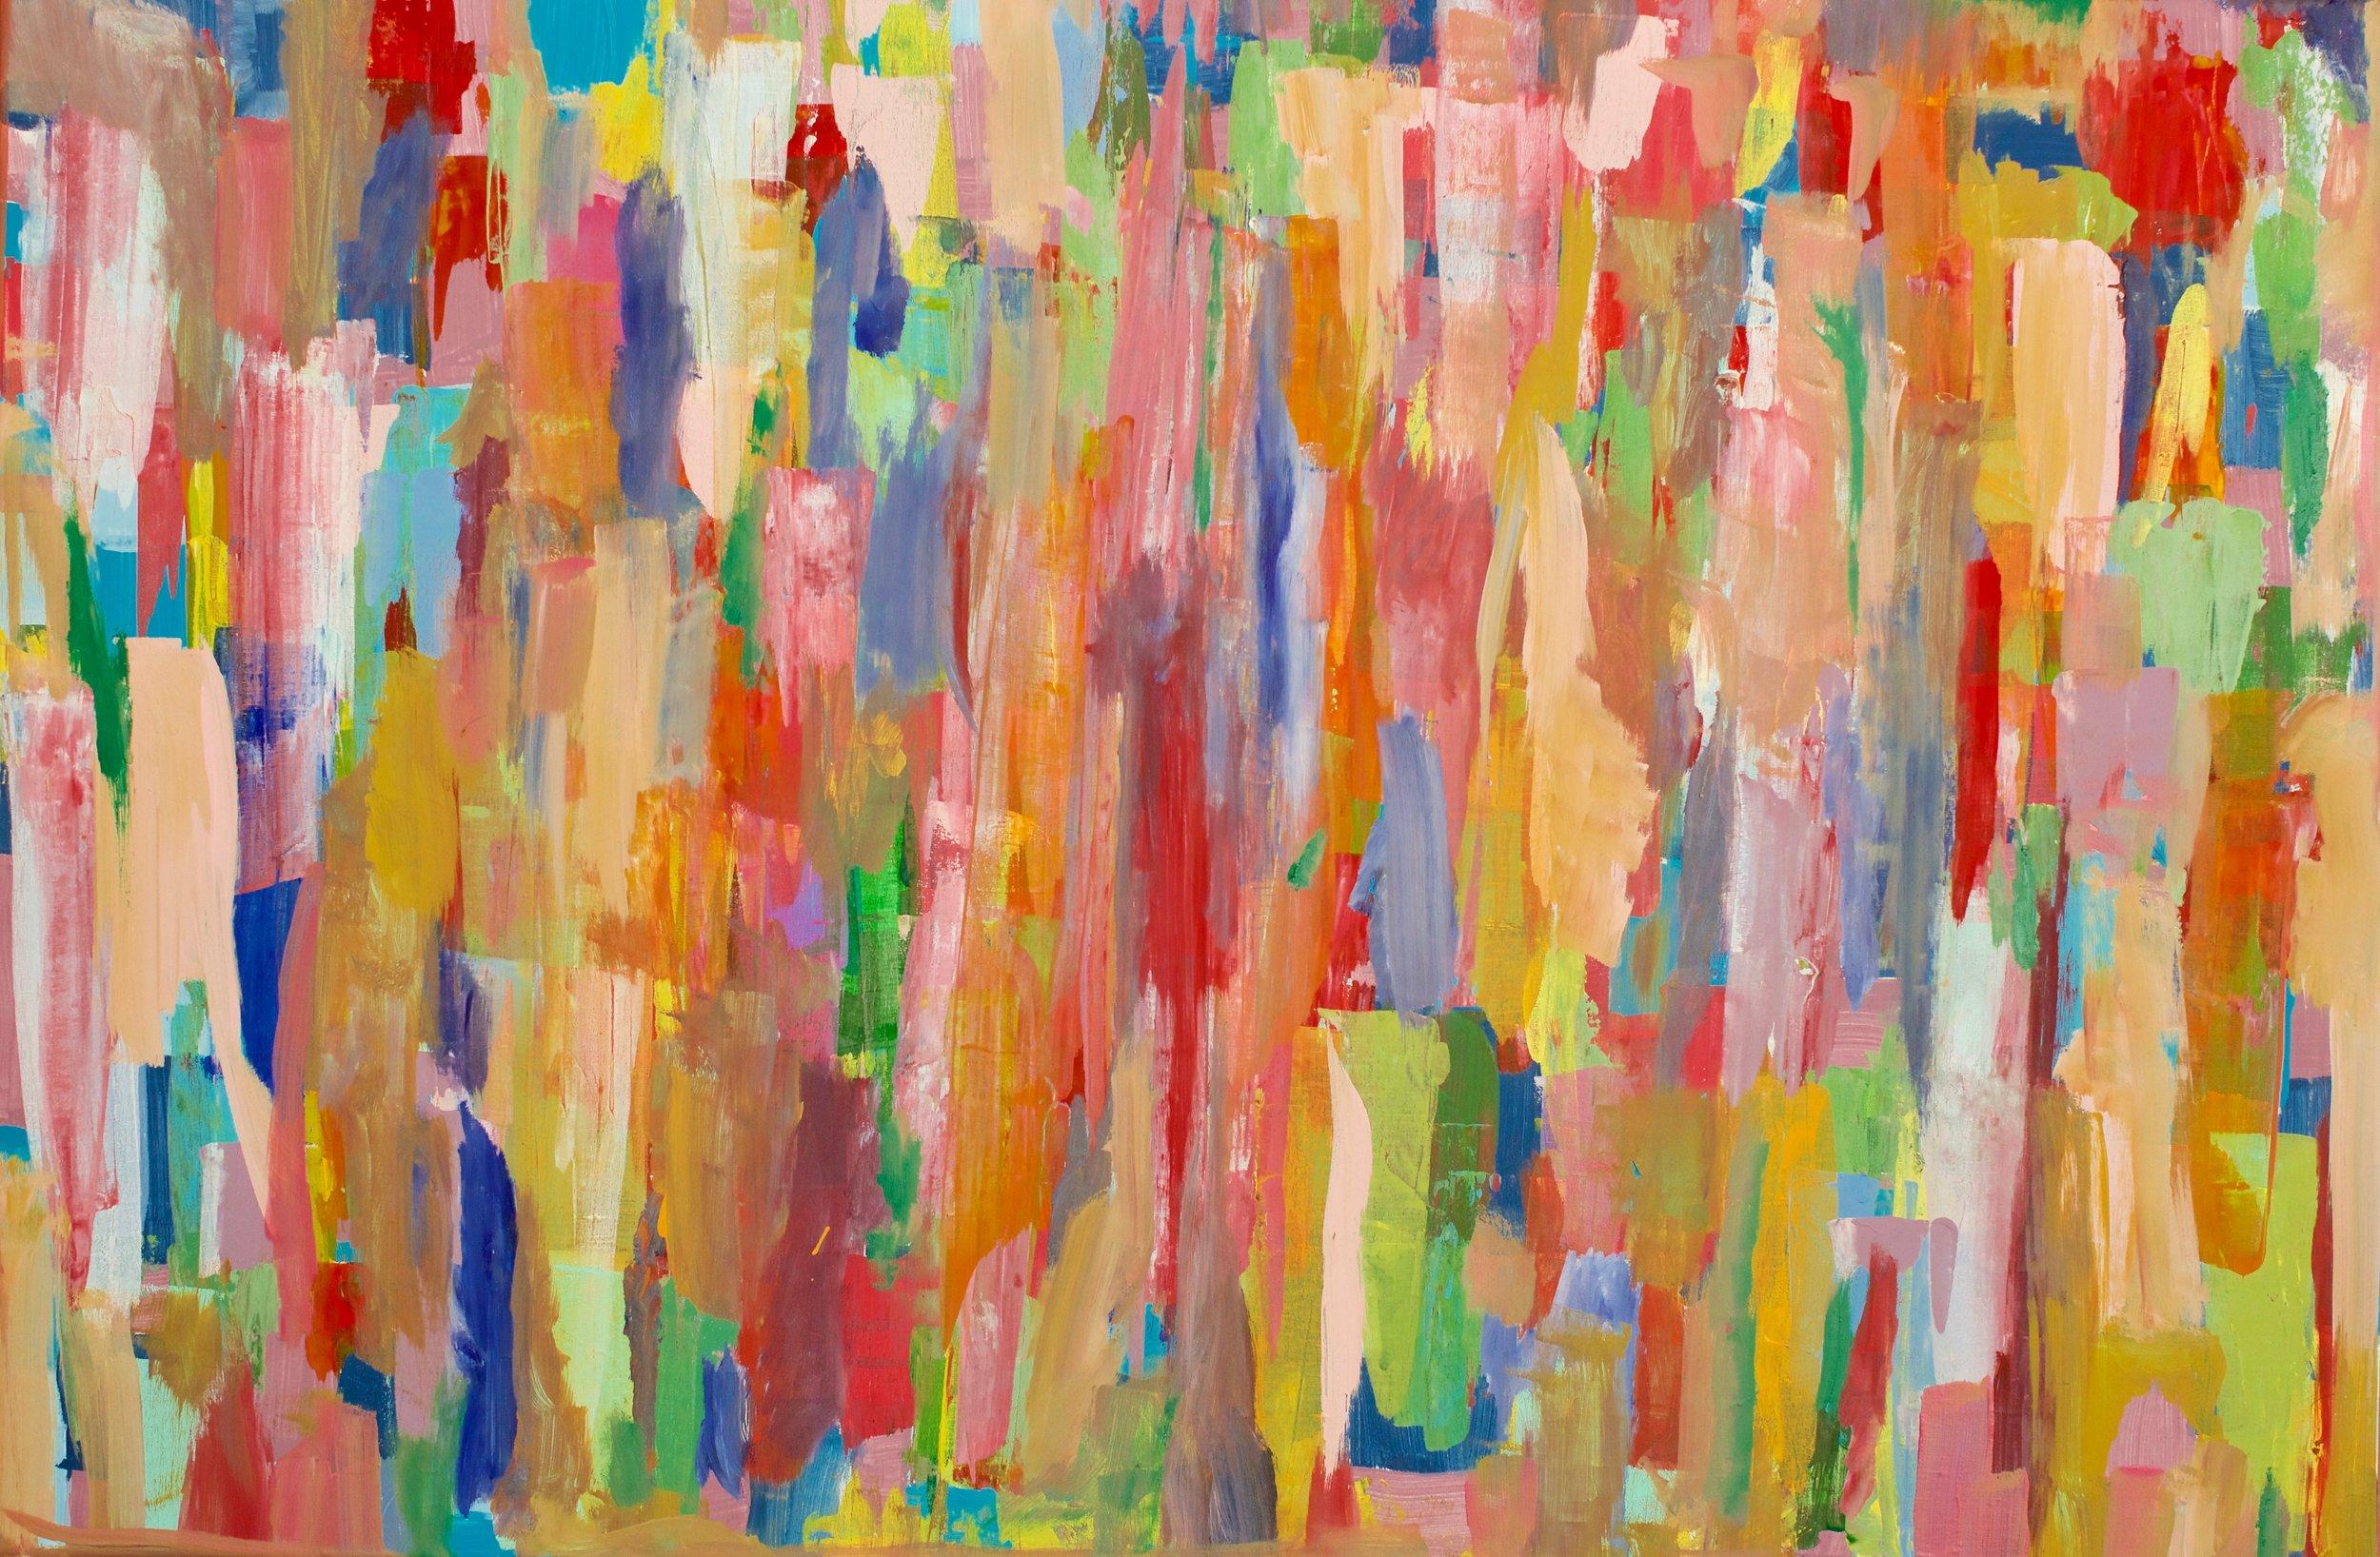 Communitas - Painting by Louis Holstein